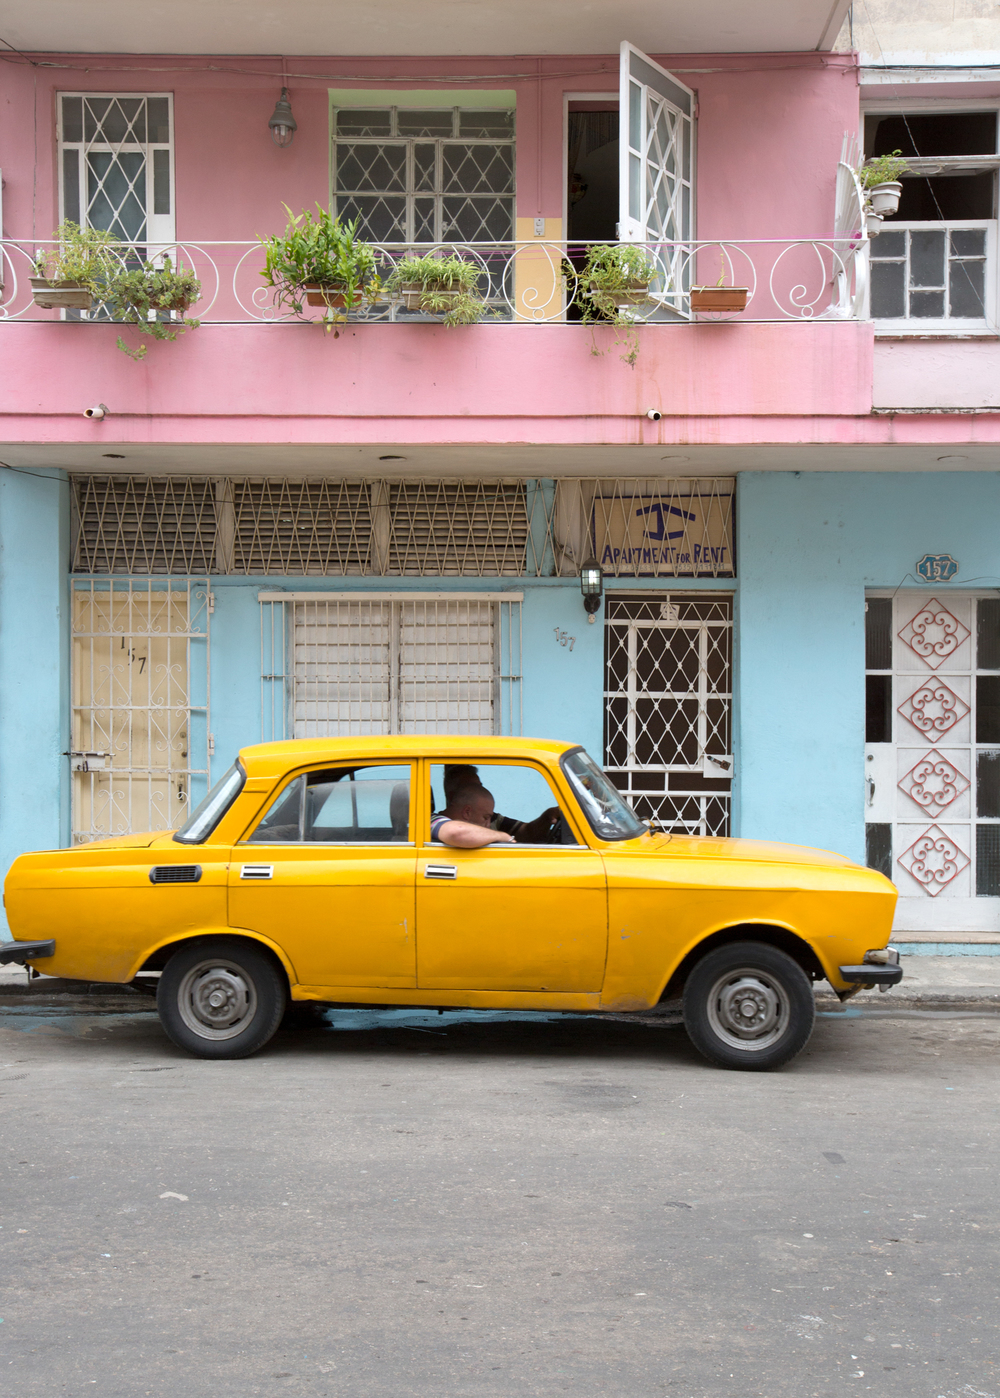 Julie_Blog_CubaColorBlocking_06.jpg